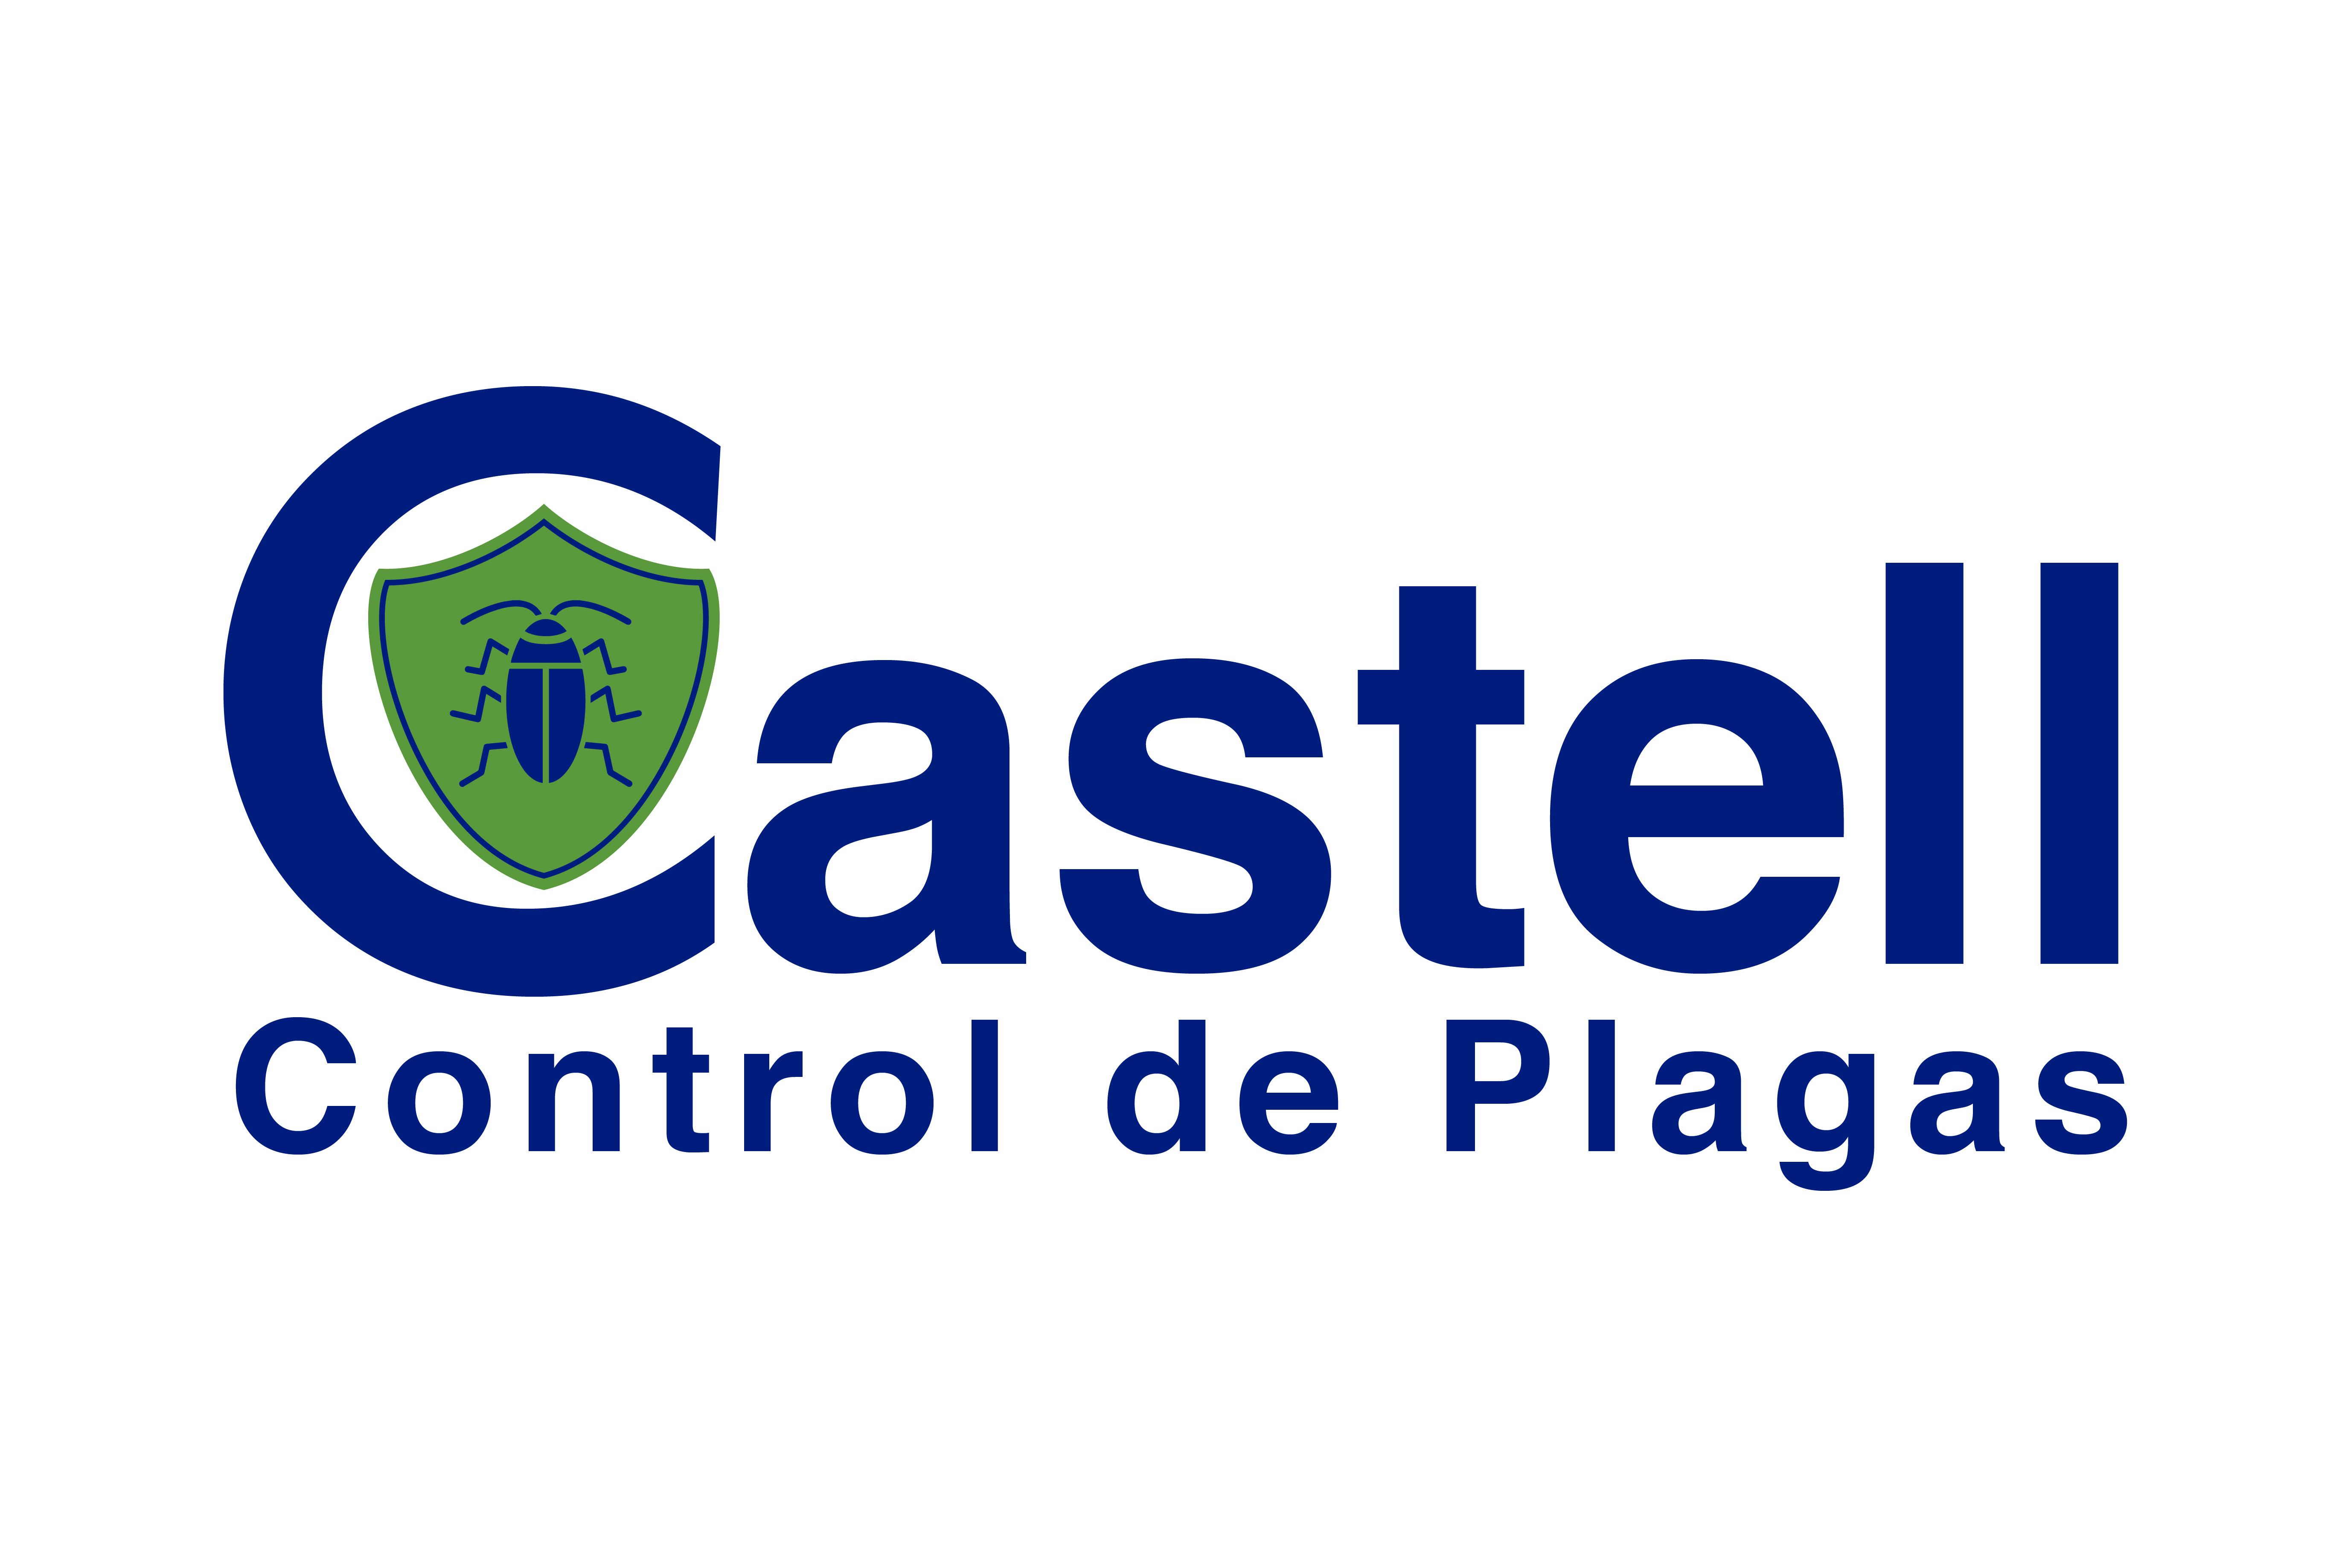 CASTELL S.A. DE C.V.